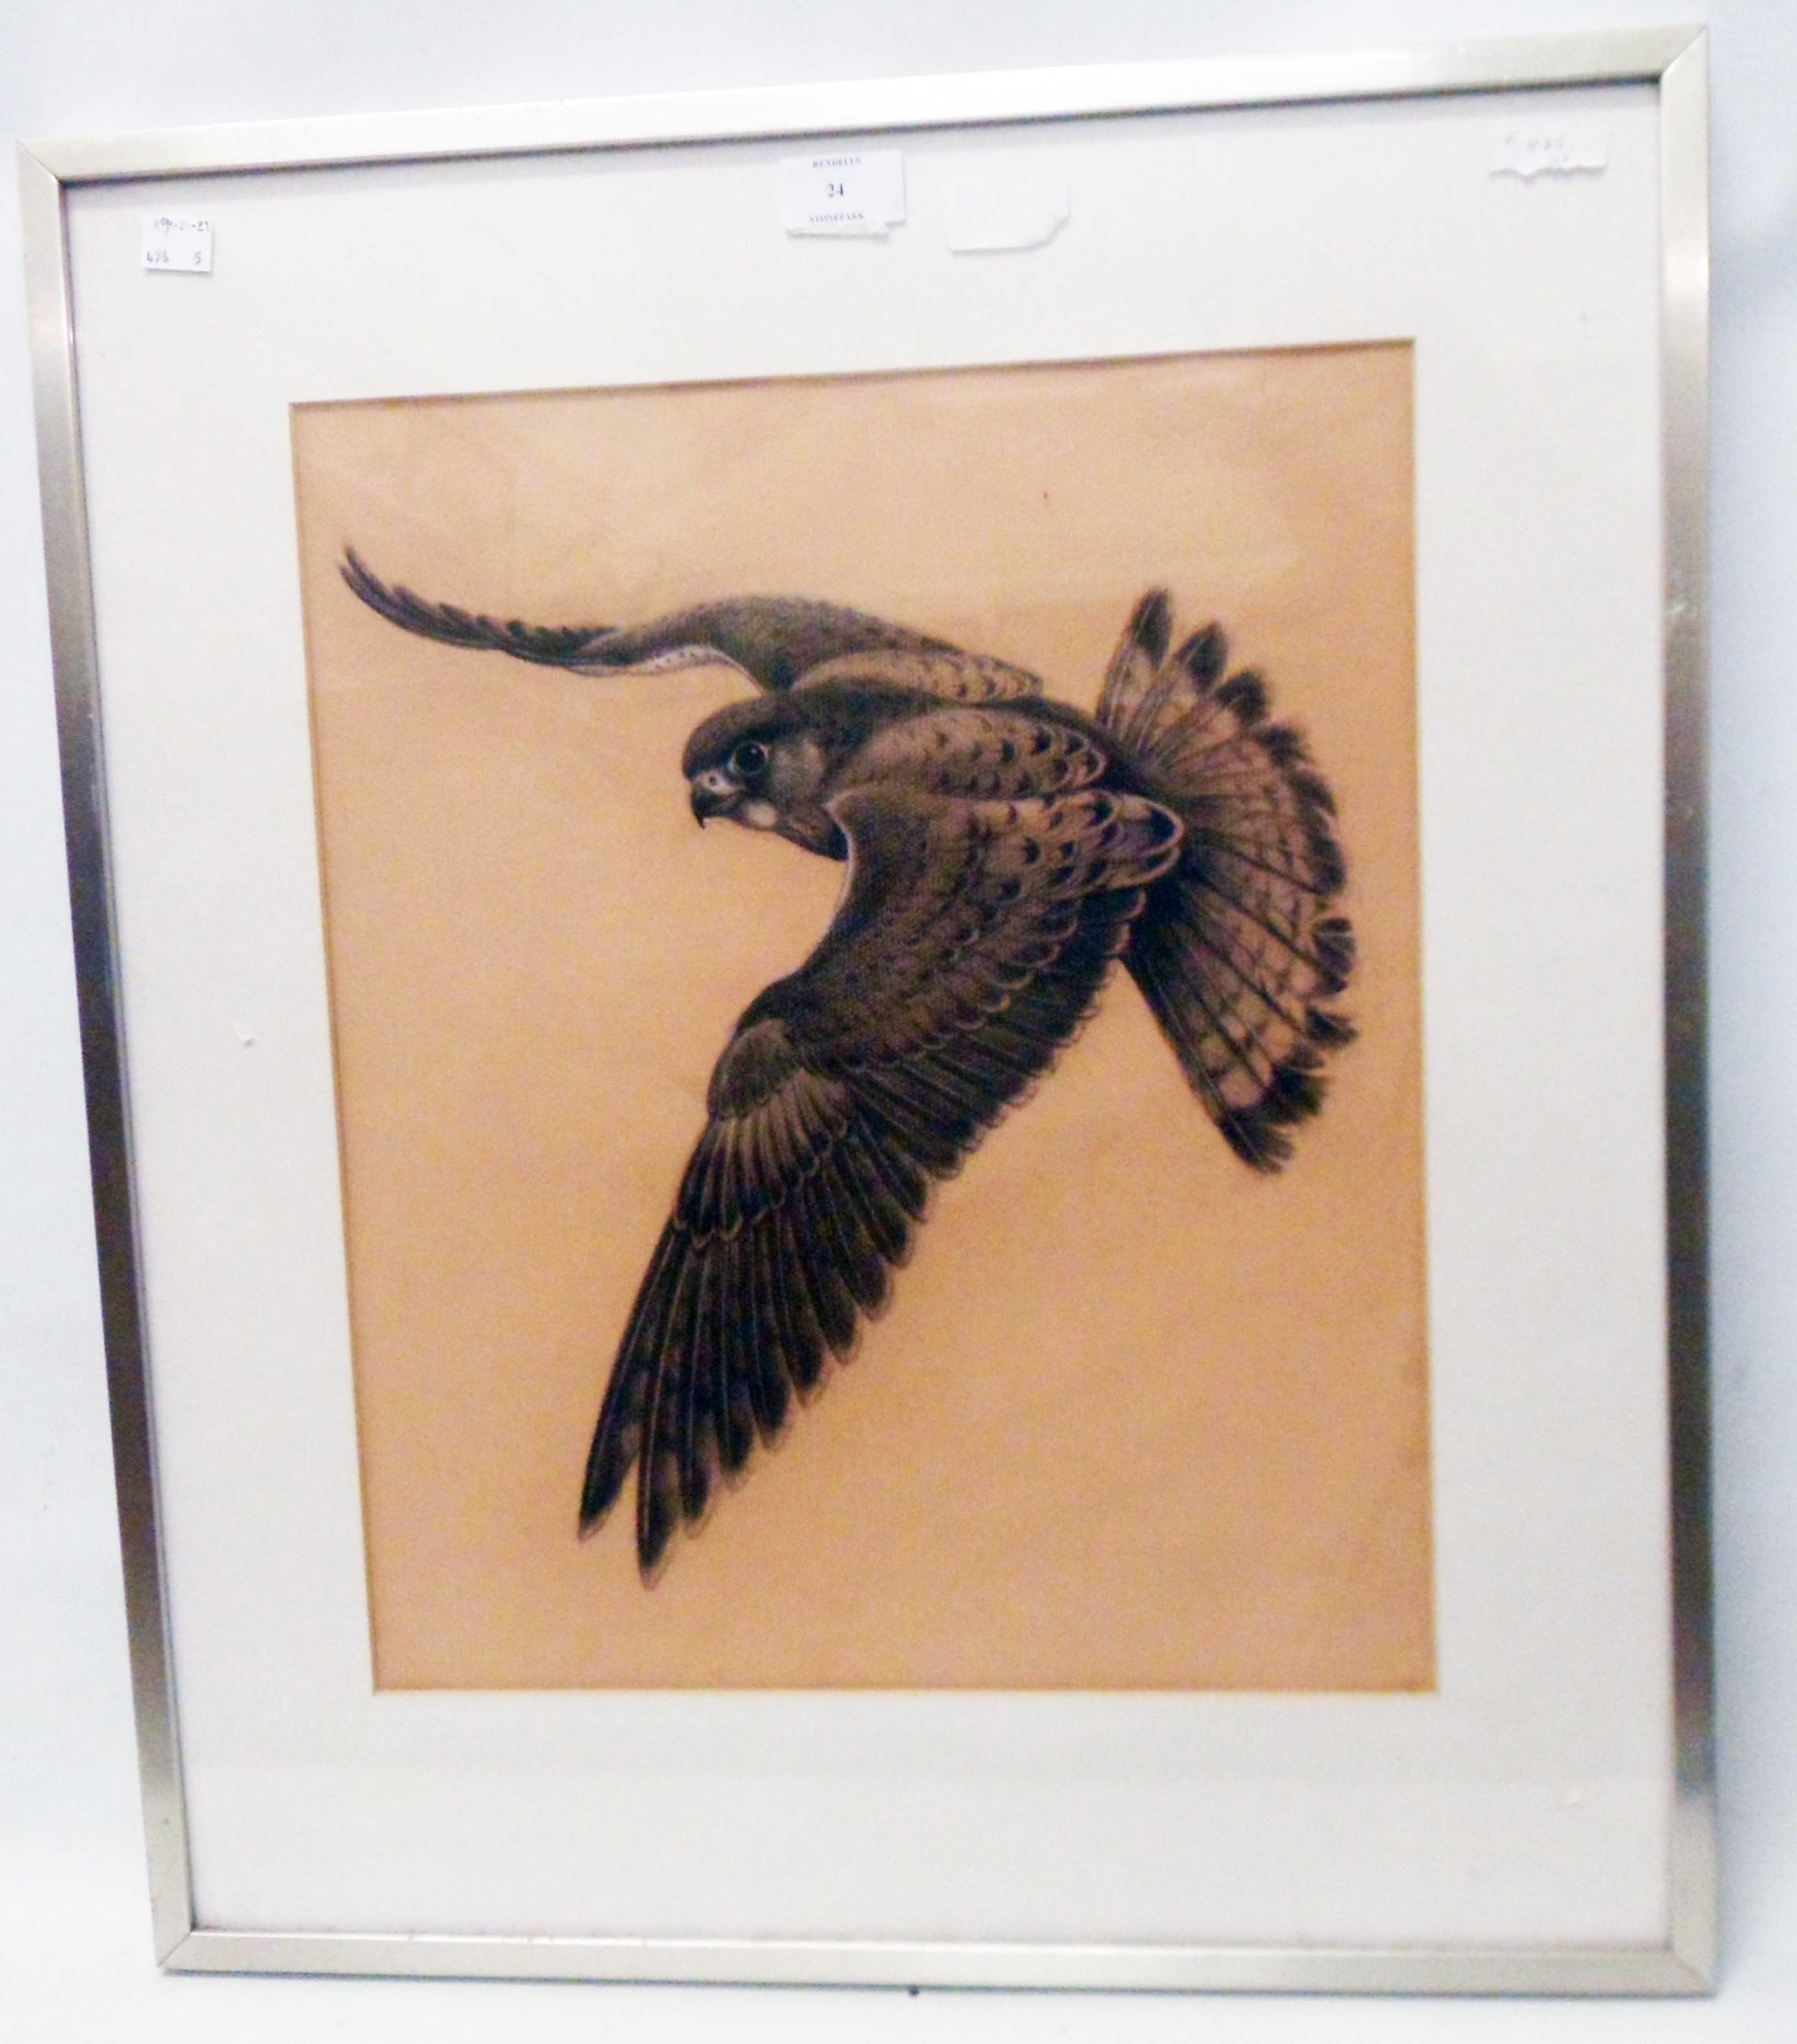 A framed mixed media drawing, depicting a hawk in flight